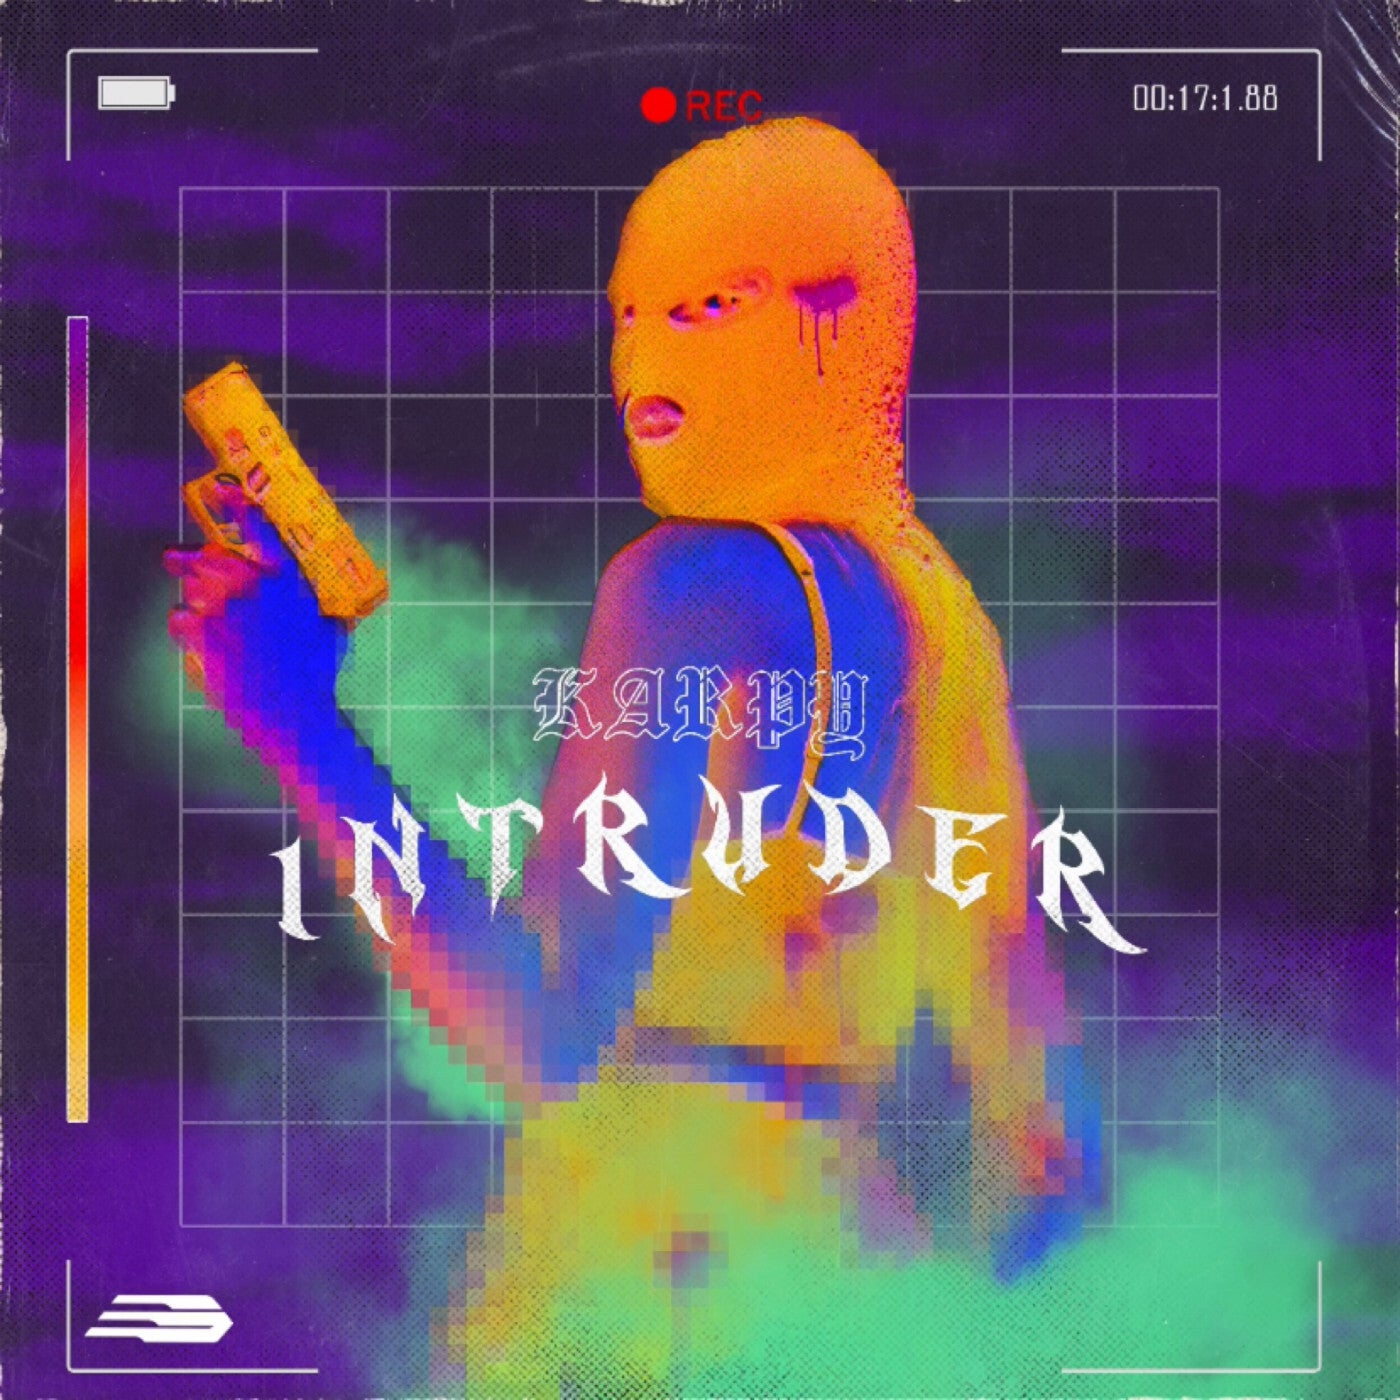 Intruder (Original Mix)